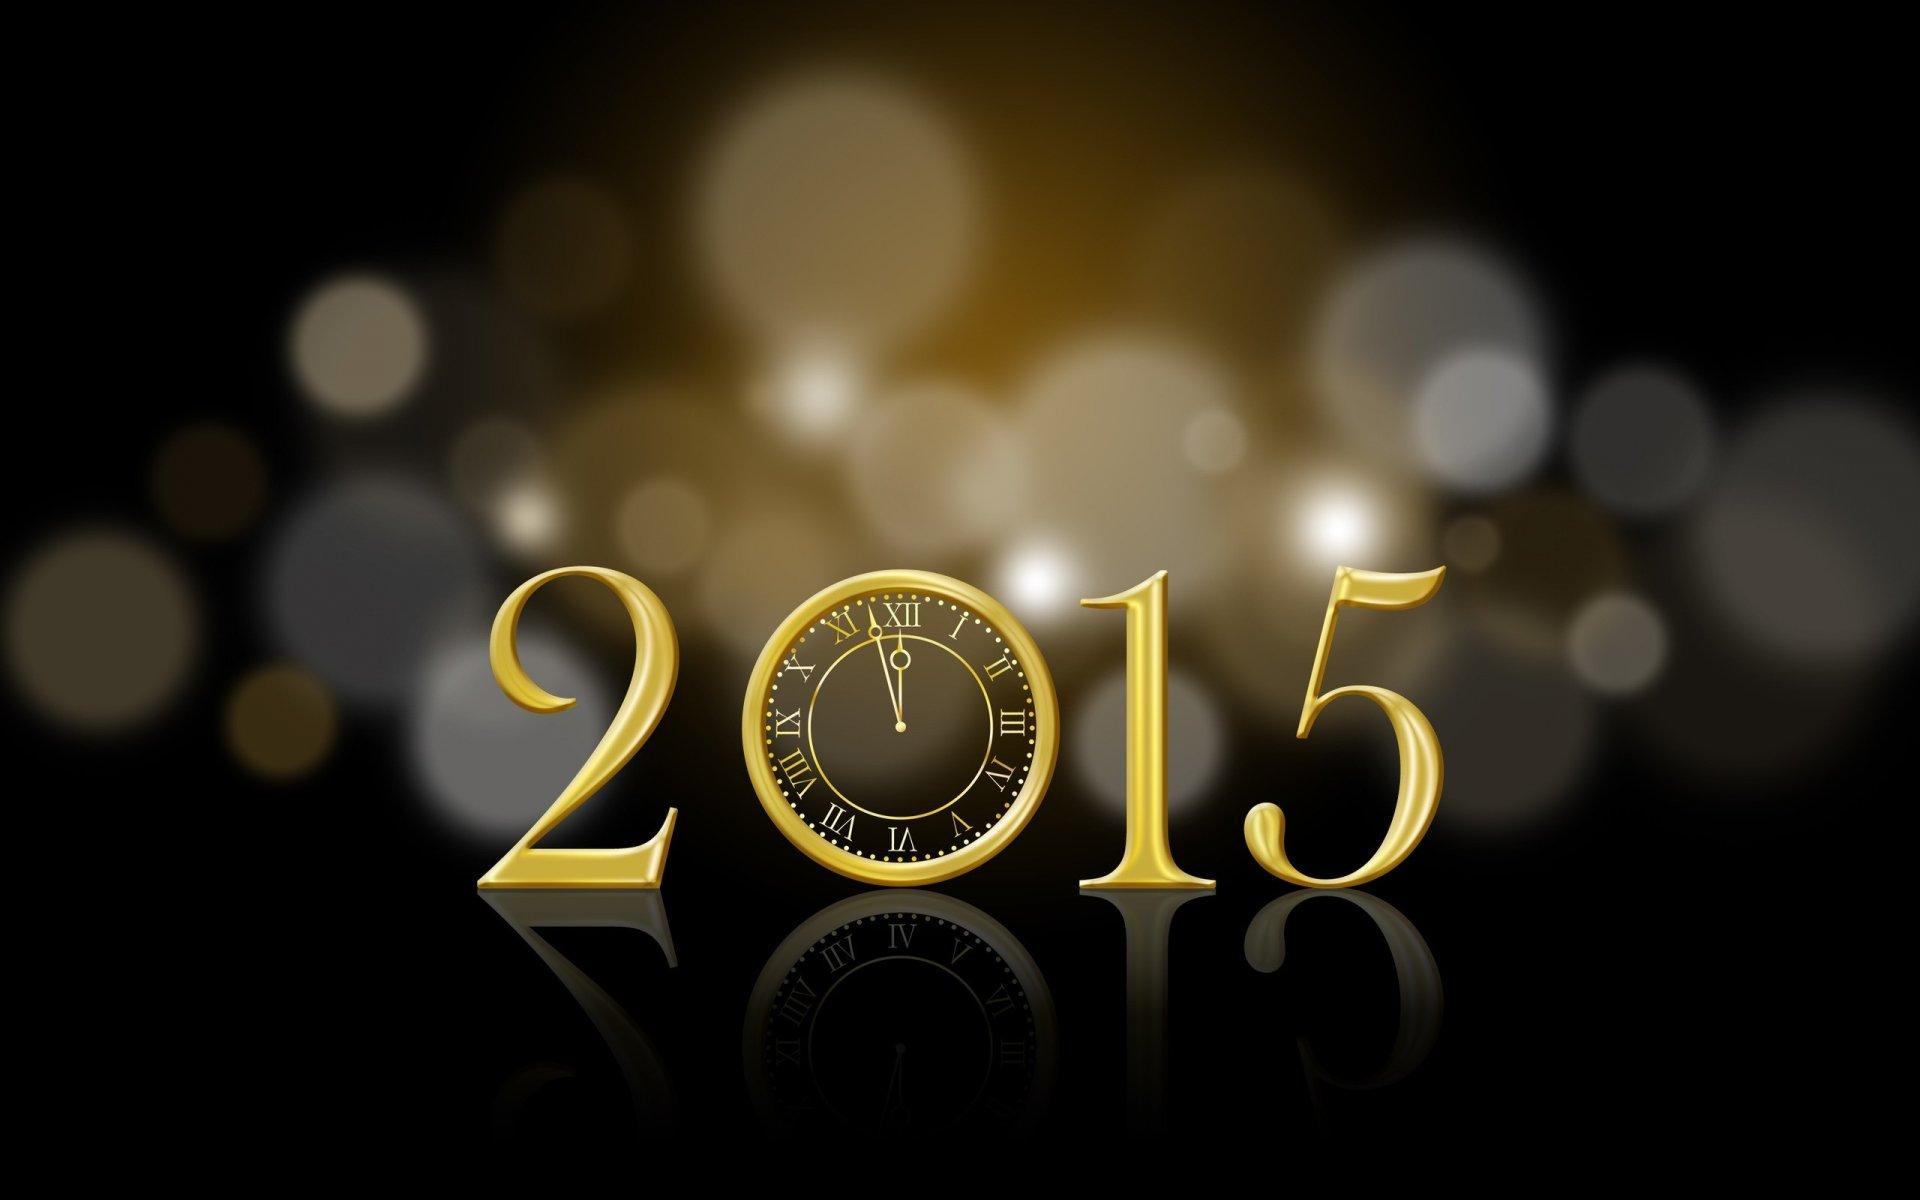 2015 бесплатно